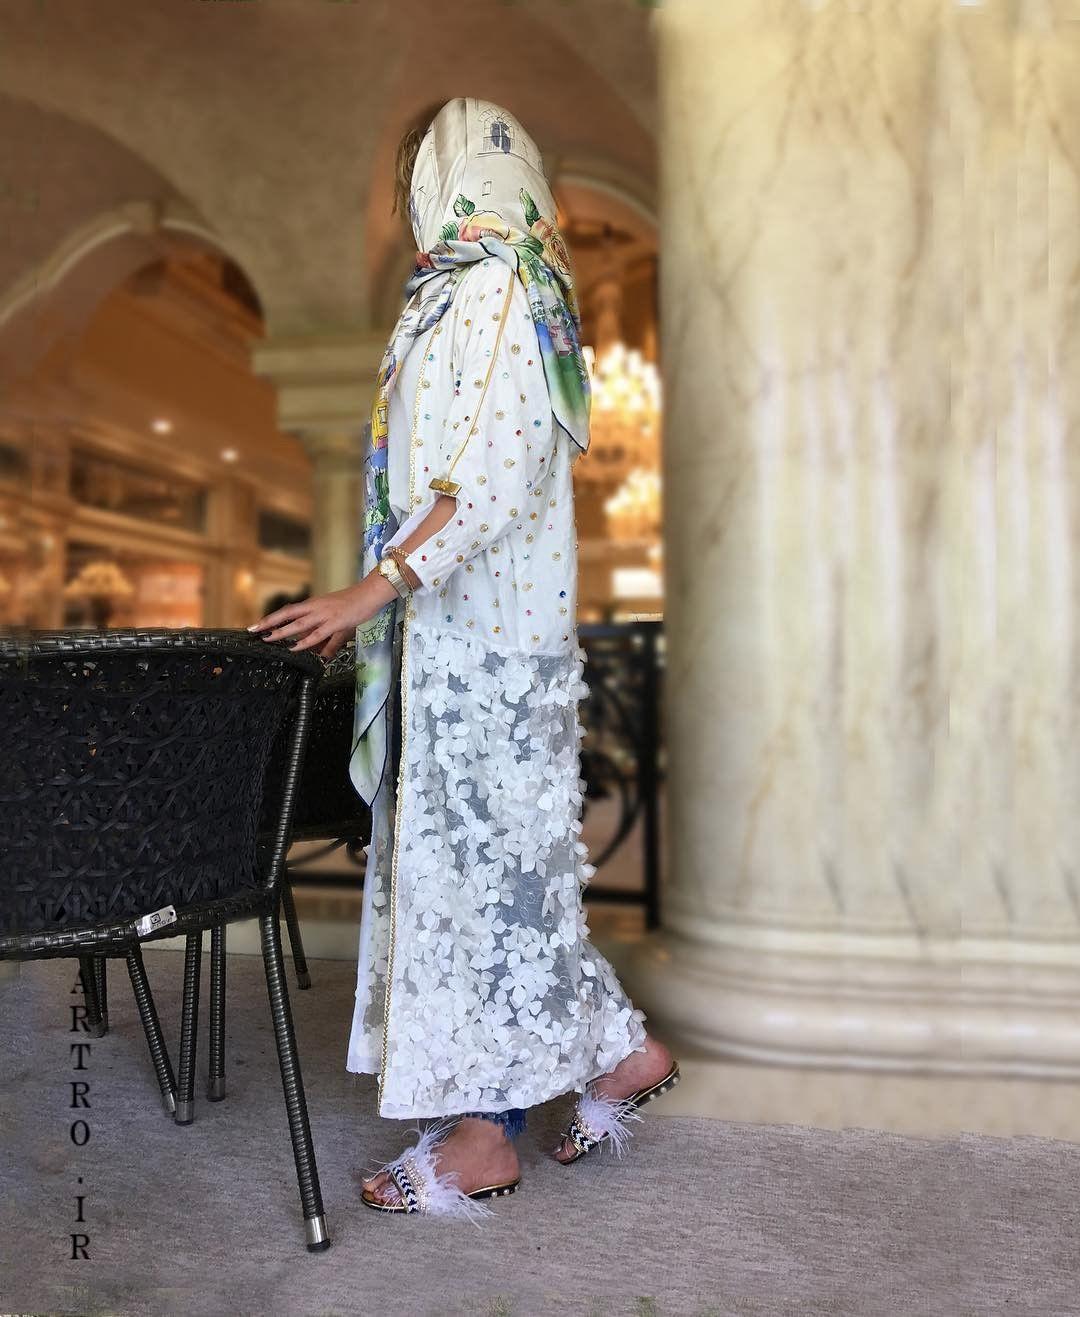 مدل مانتو بلند جلوباز تابستانی 2019